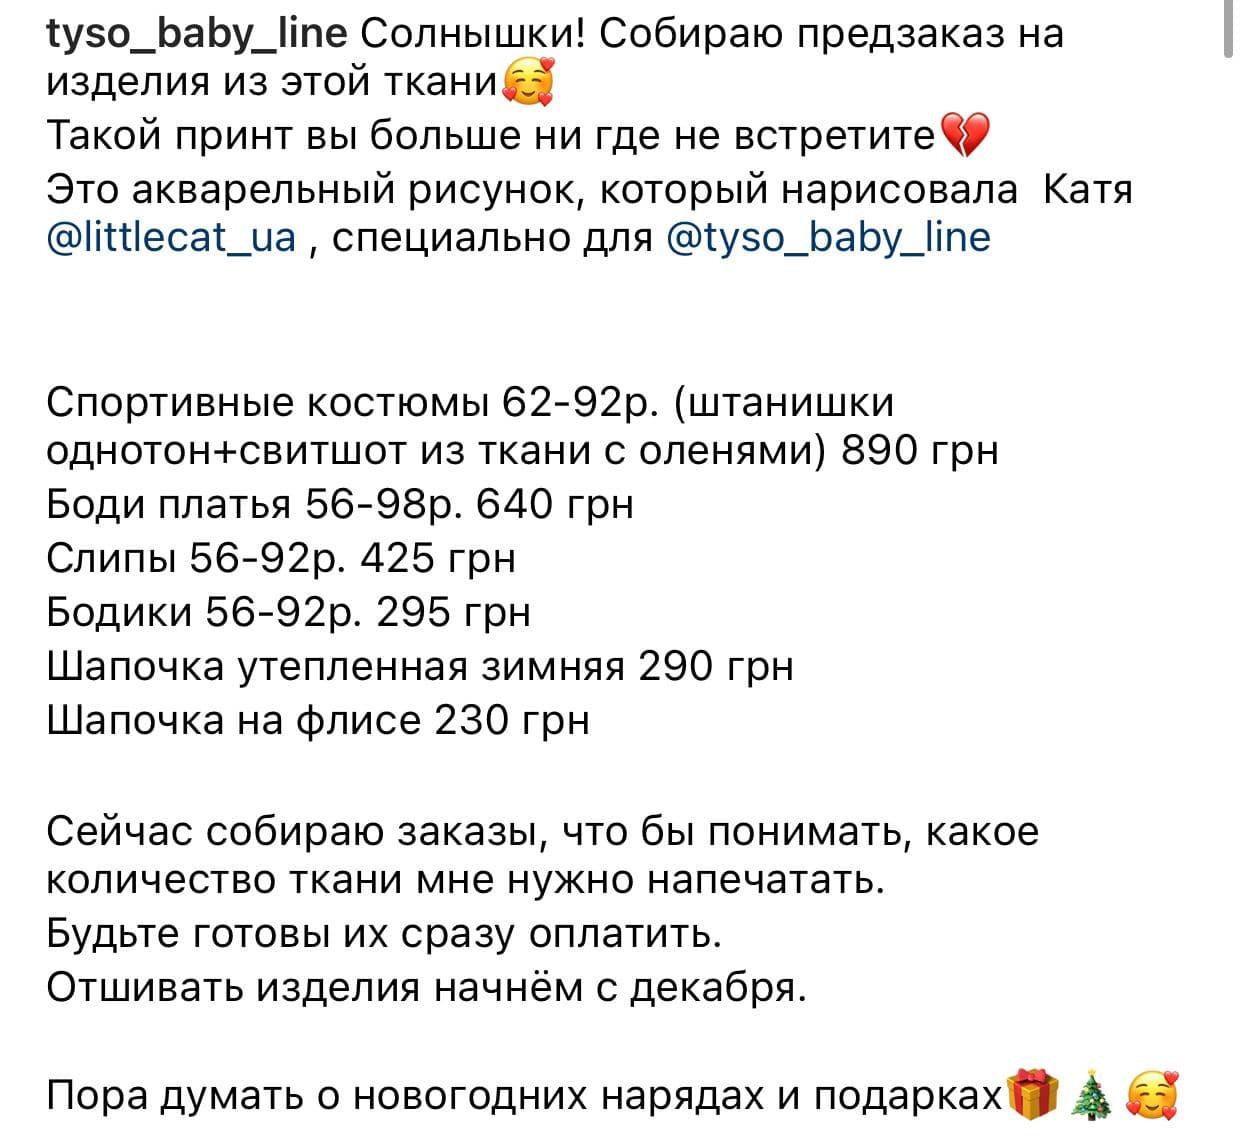 Instagram prices